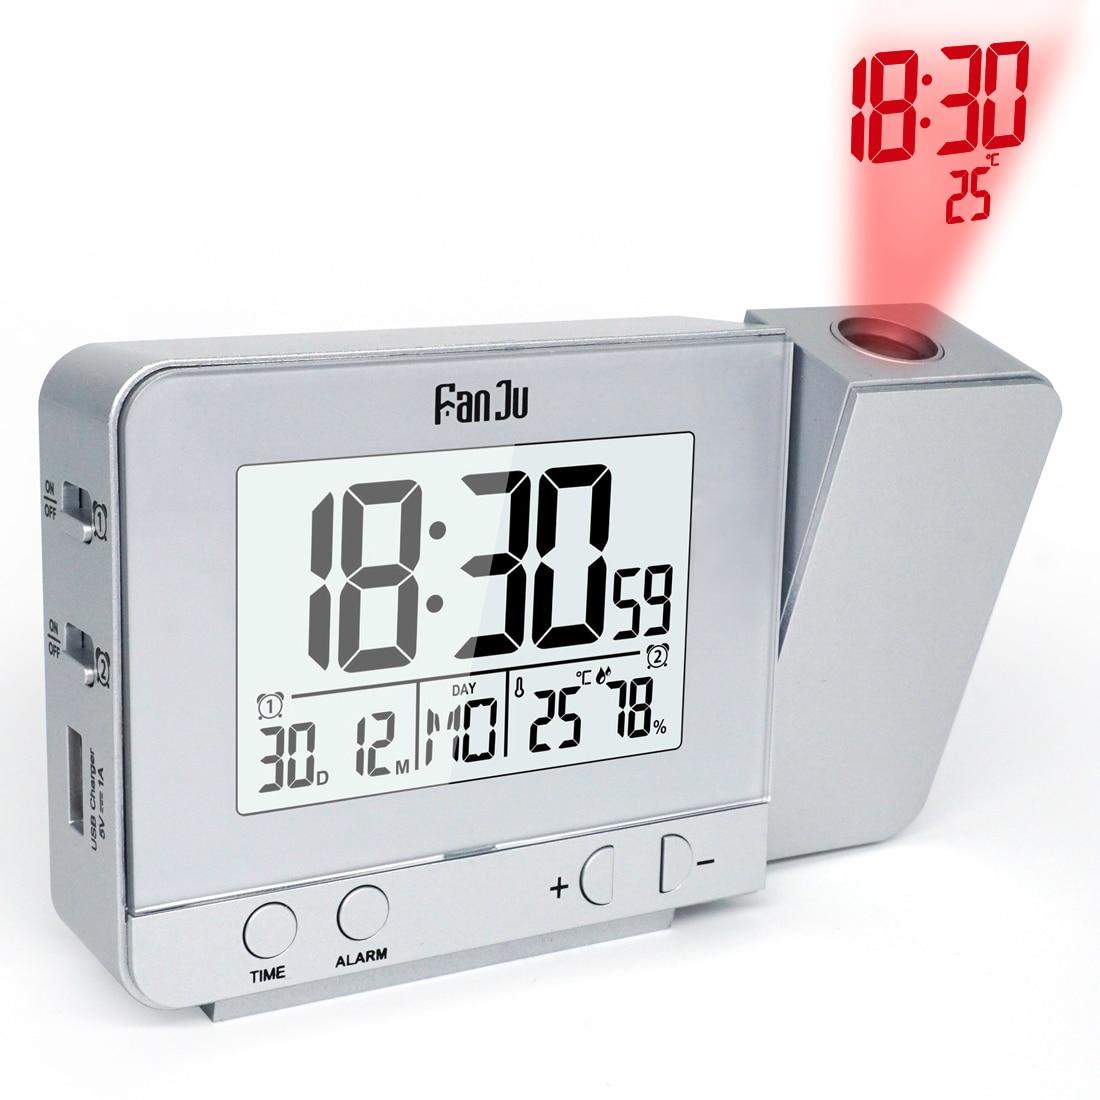 FanJu цифровой Повтор будильника функция проекции подсветка проектор стол FJ3531